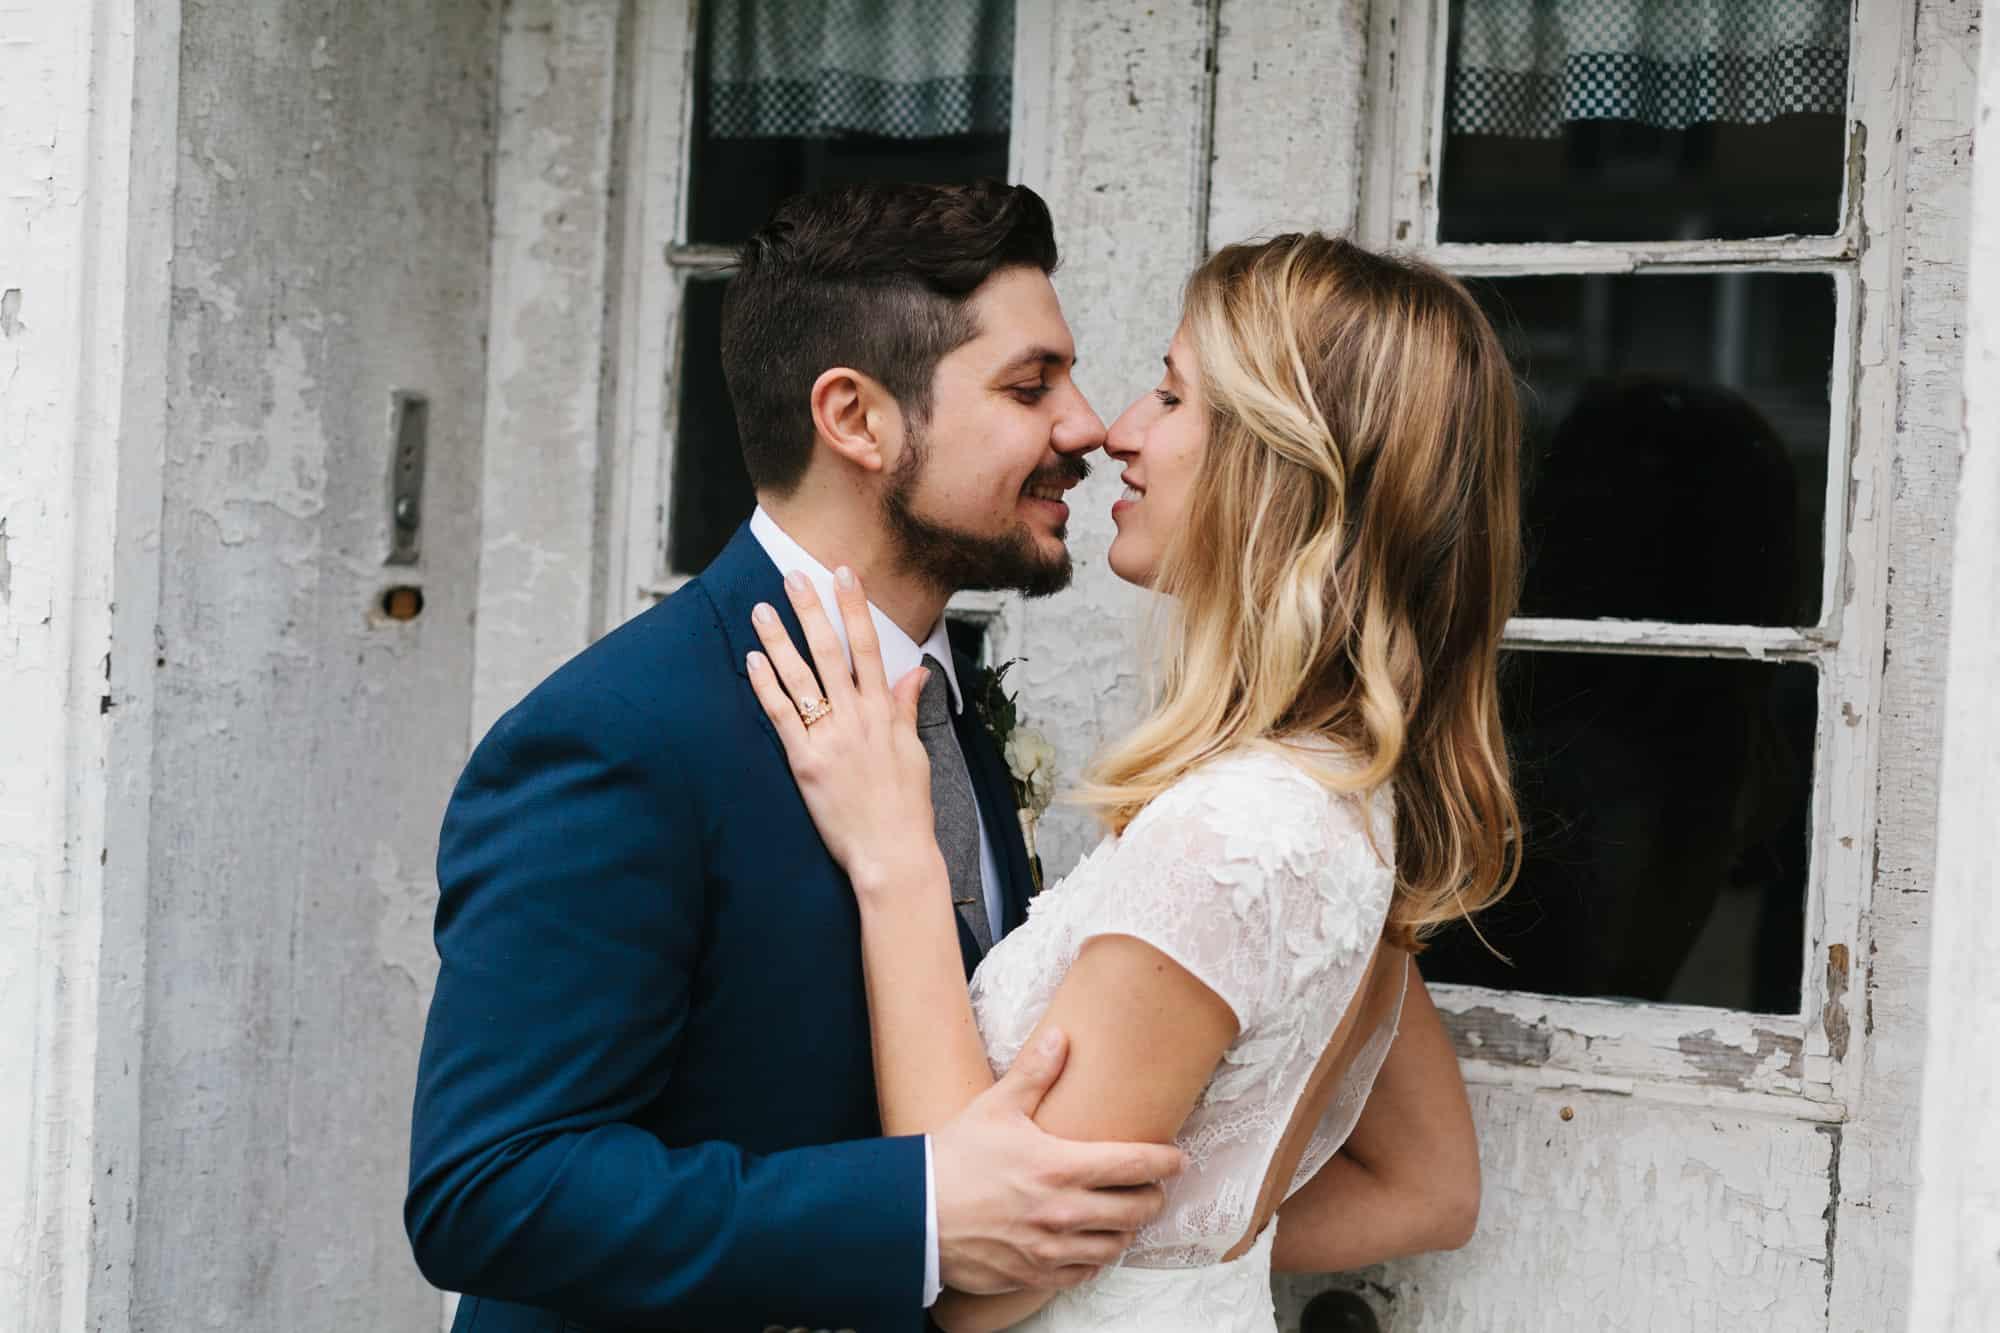 Waterloo Village wedding venue in New Jersey by Kate Lamb of Wild in Love Photo